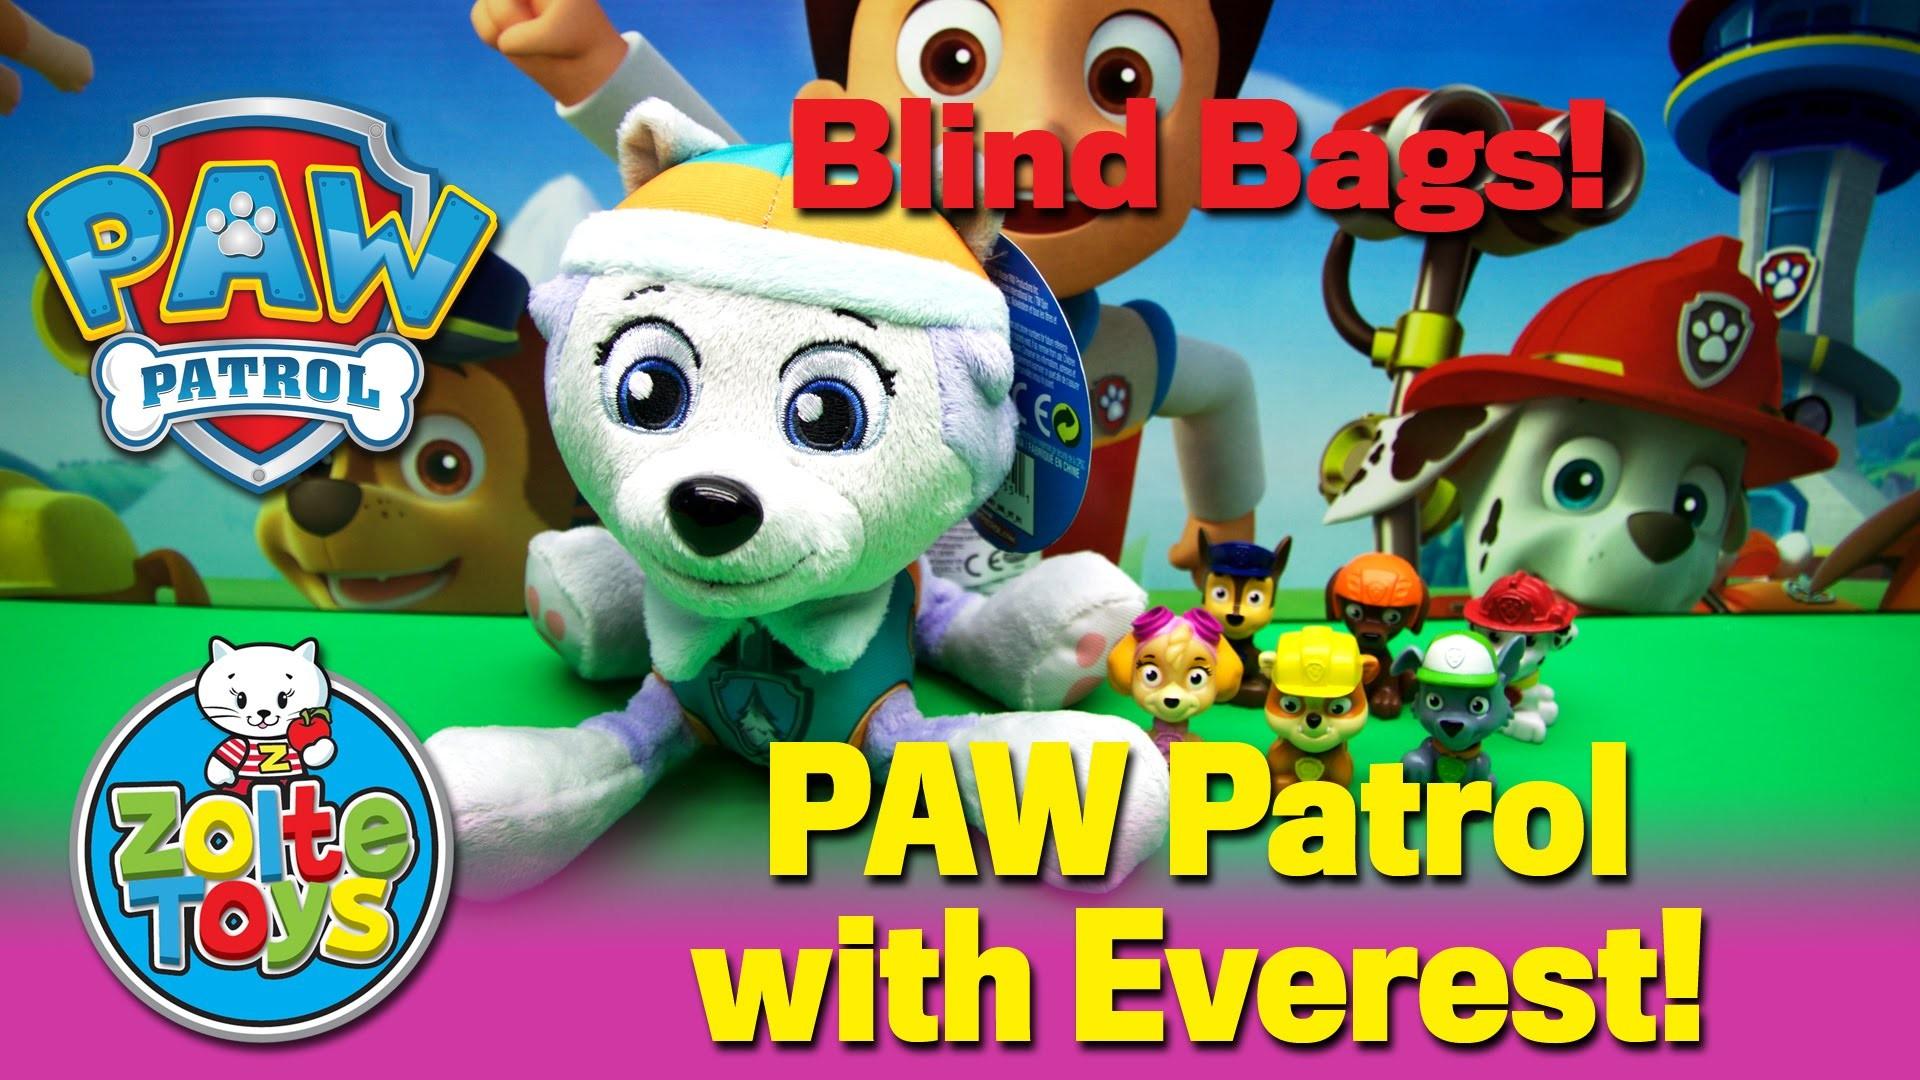 Paw Patrol Background 1 Download Free Wallpapers For Desktop